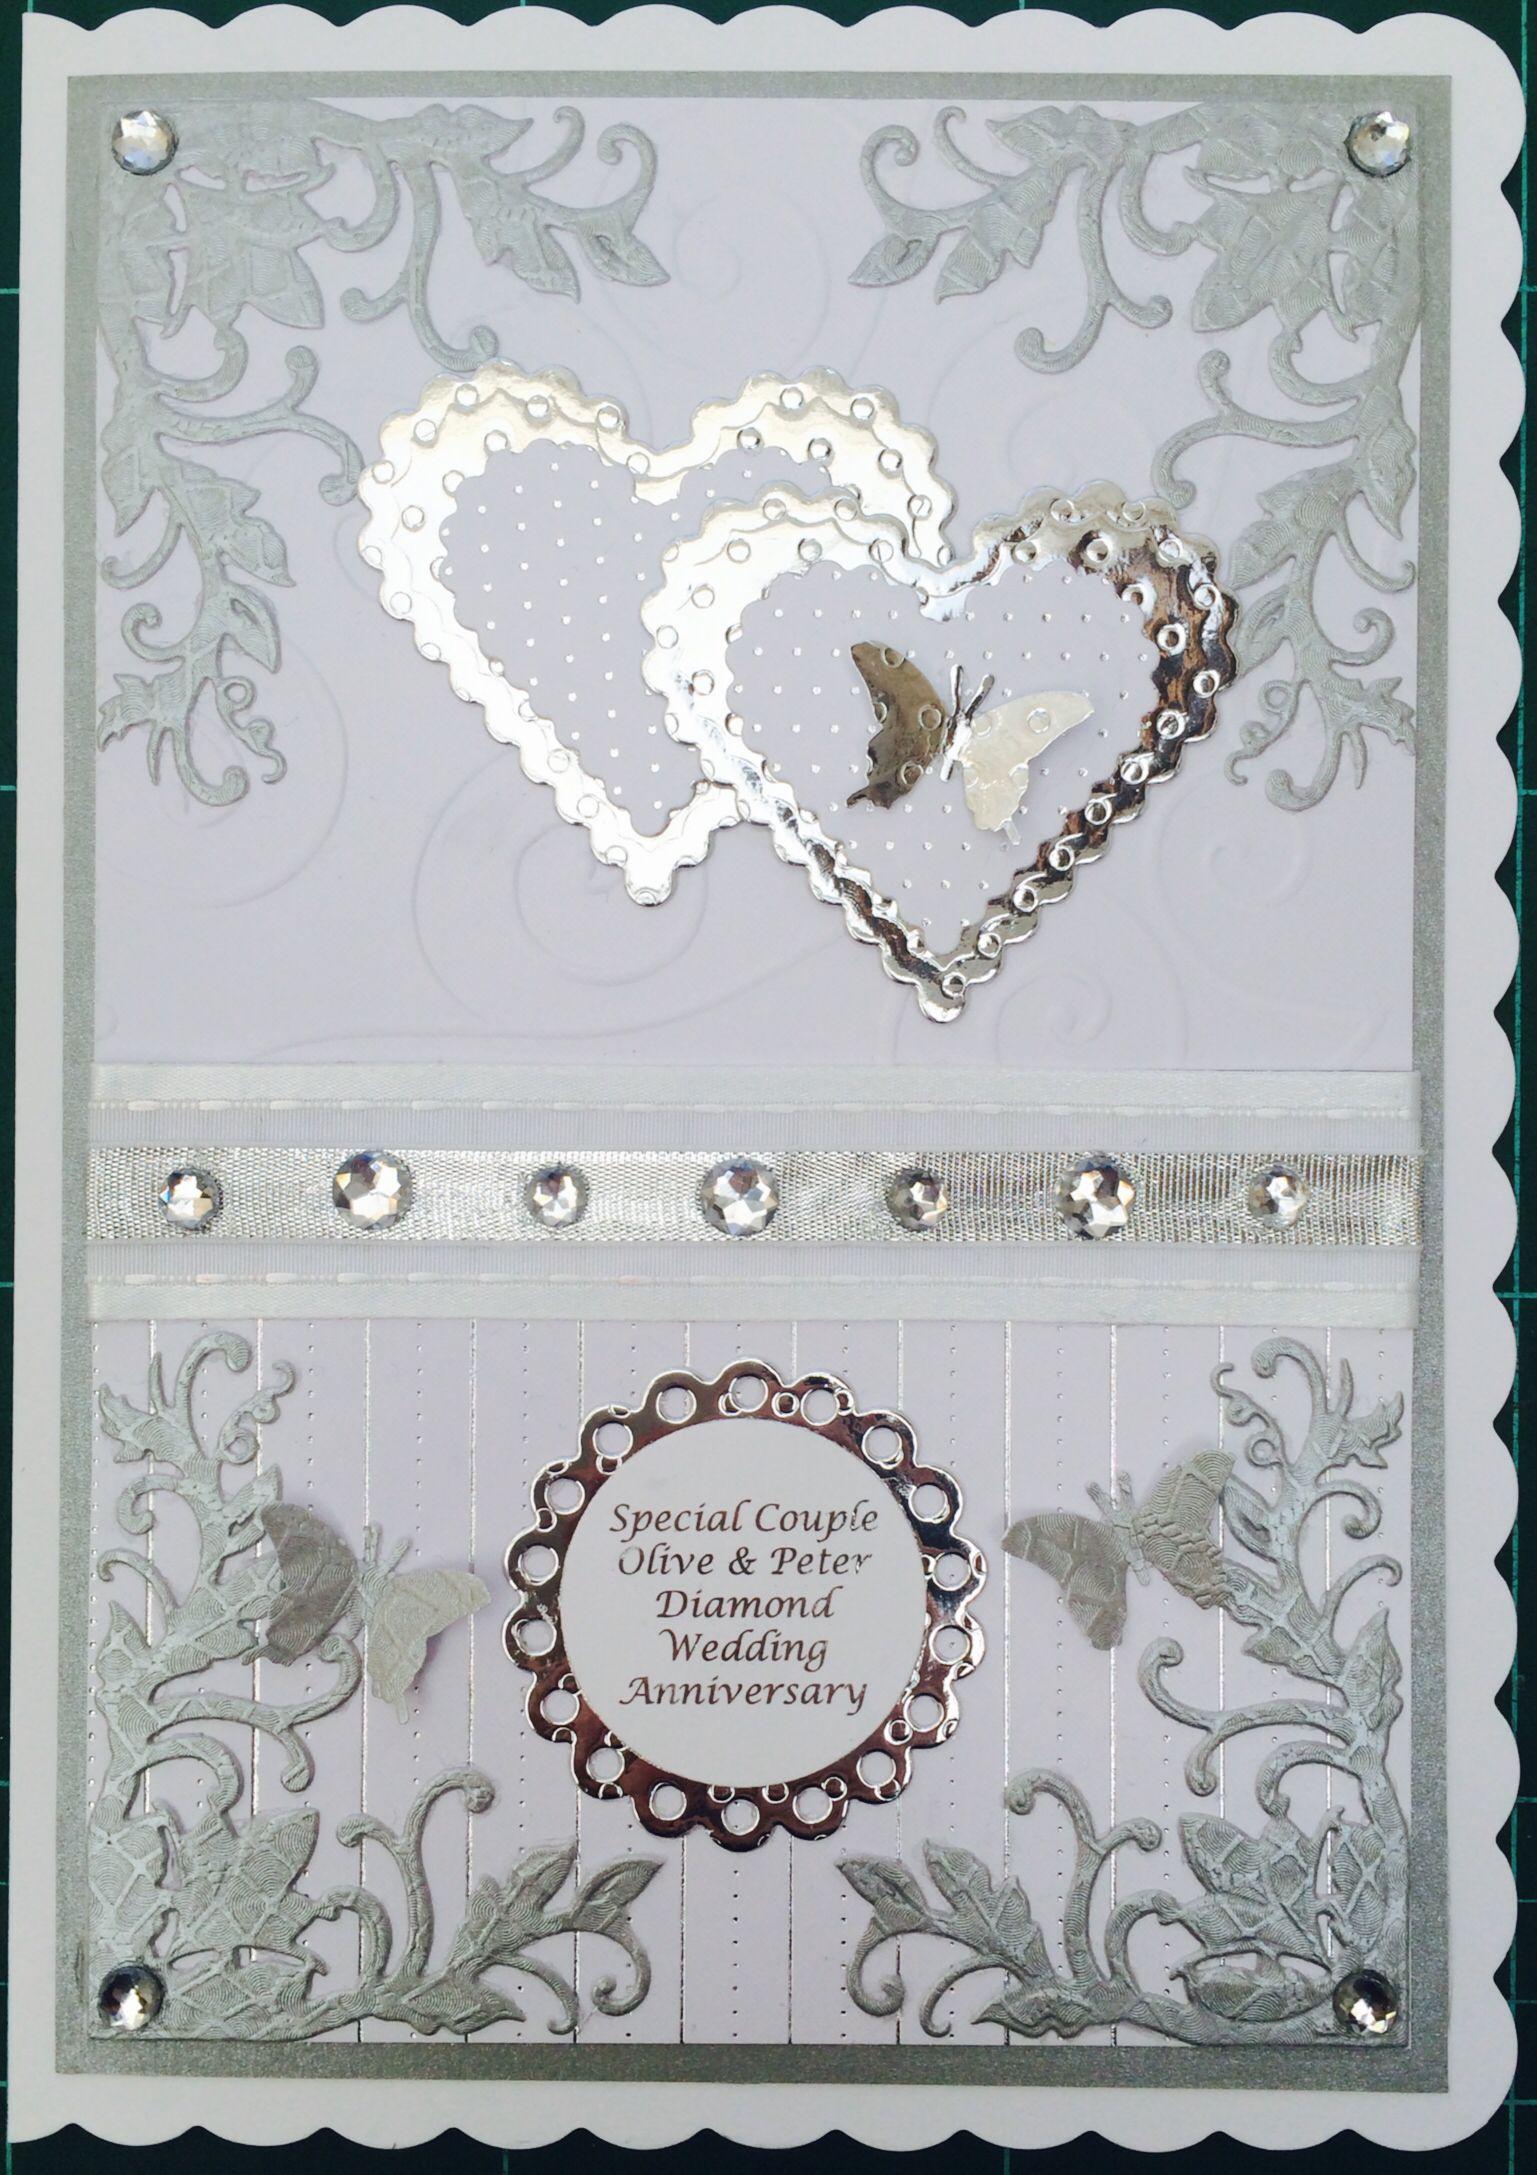 Handmade diamond wedding anniversary card wwwuk